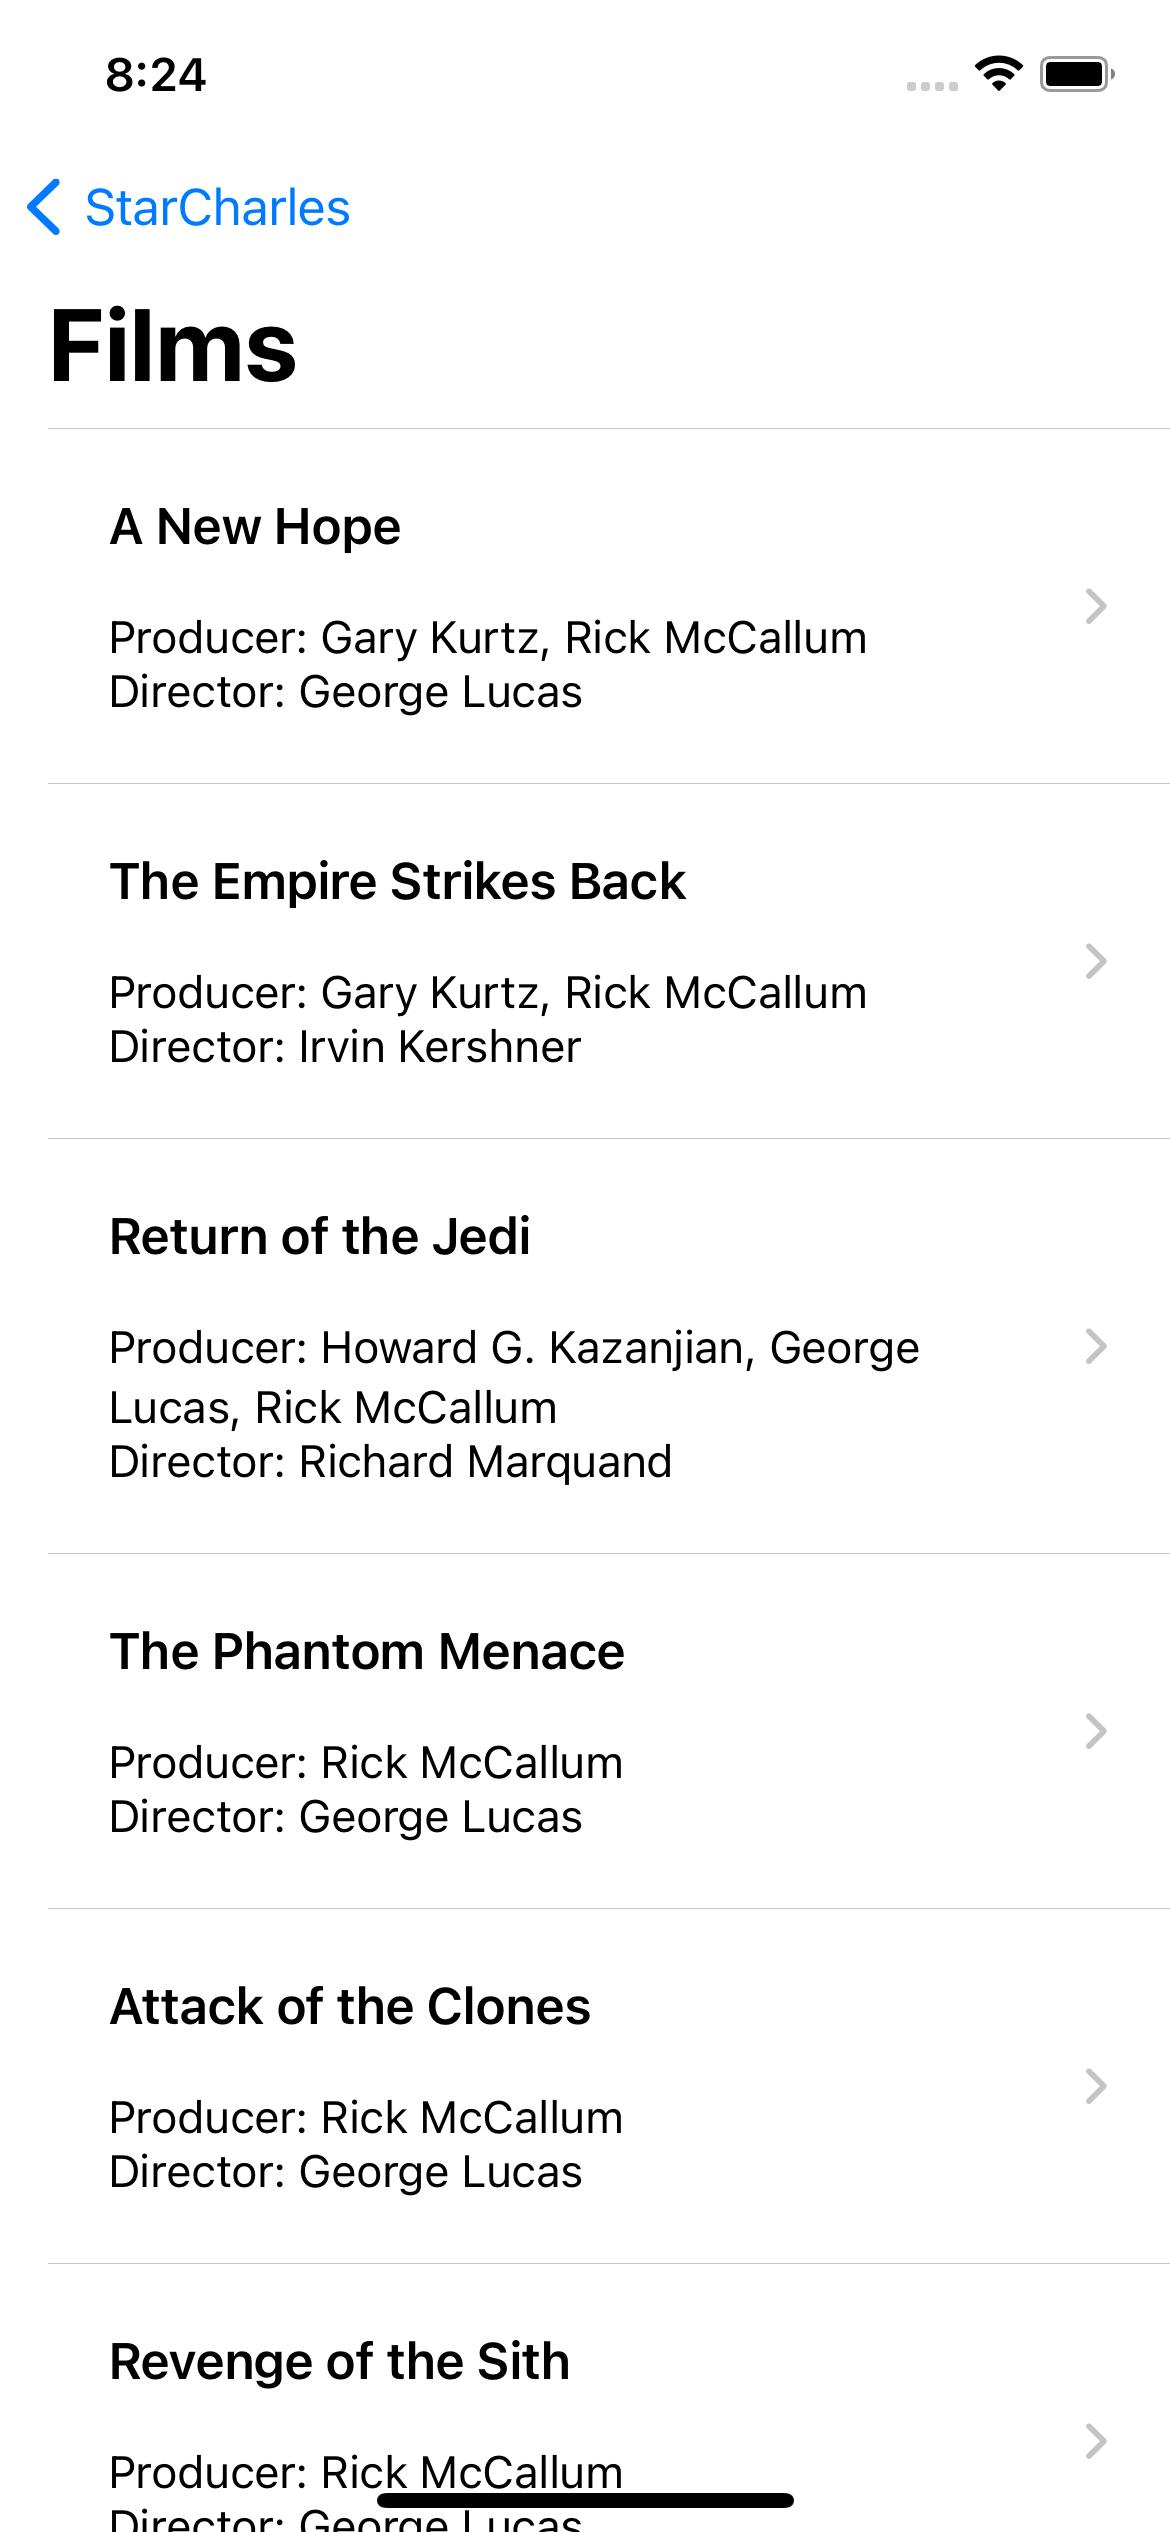 StarCharles Star Wars data sample app Films page